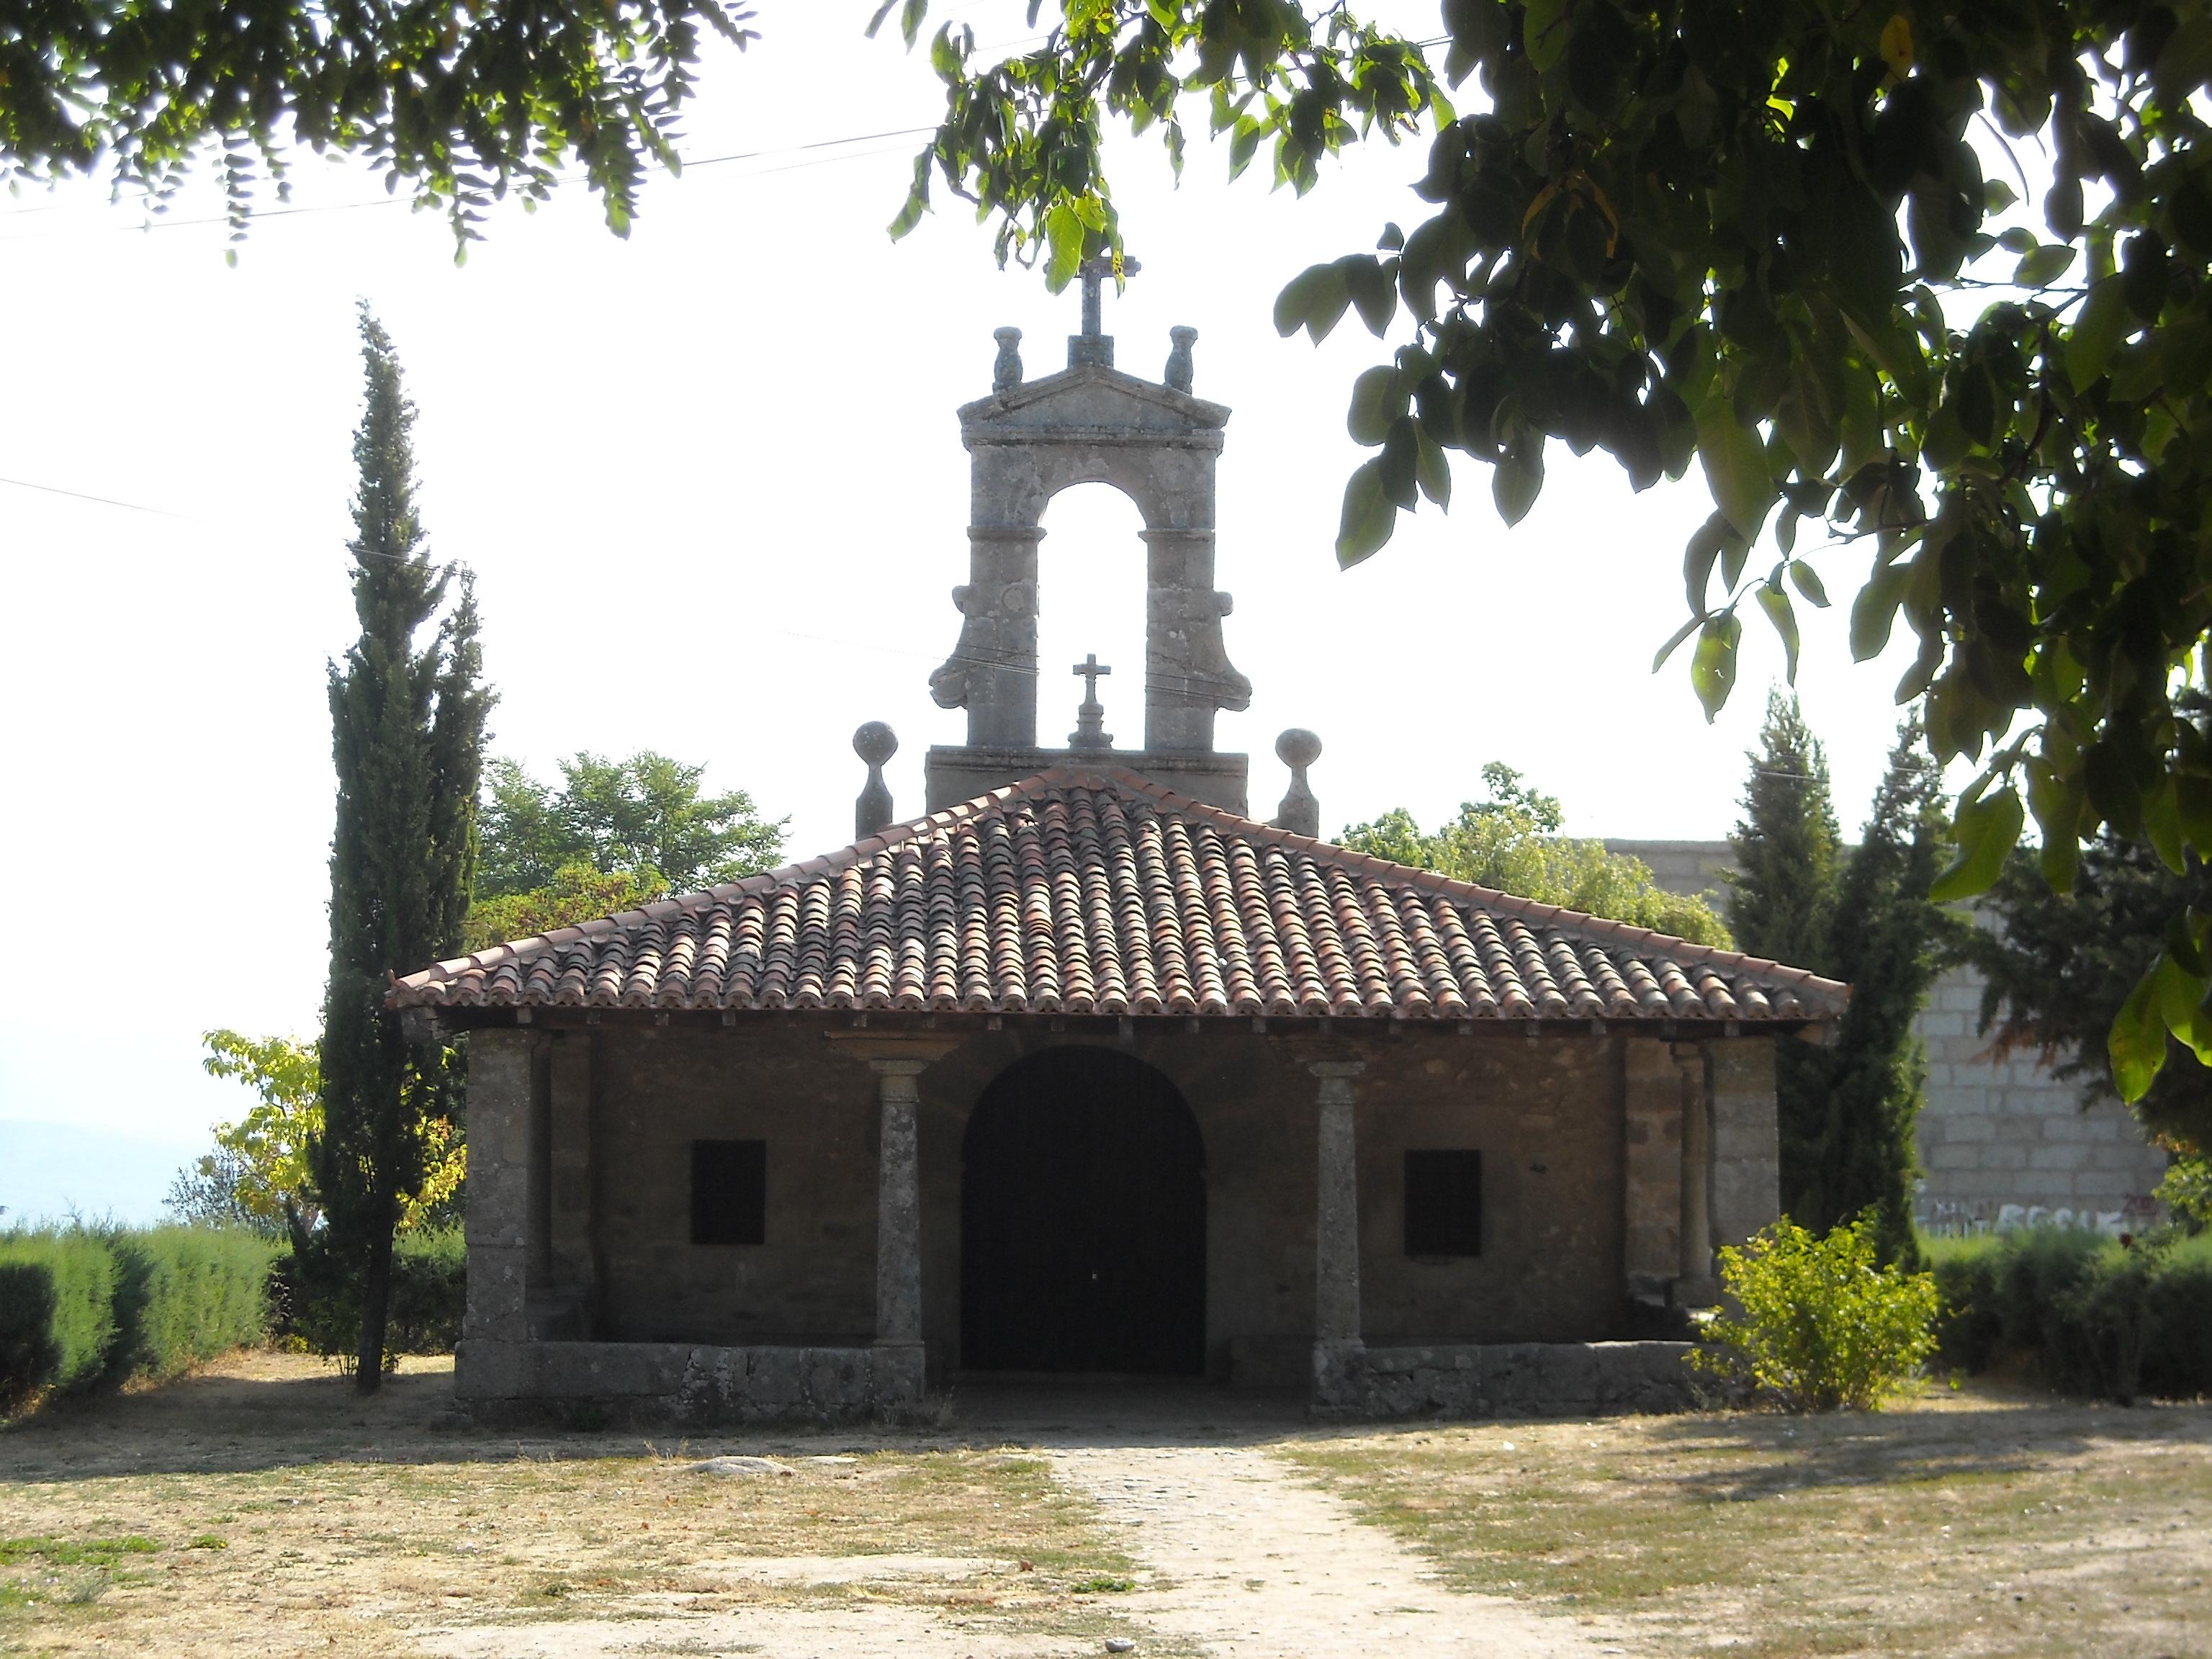 http://upload.wikimedia.org/wikipedia/commons/3/3f/Ermita_de_San_Blas%2C_La_Alberca.JPG